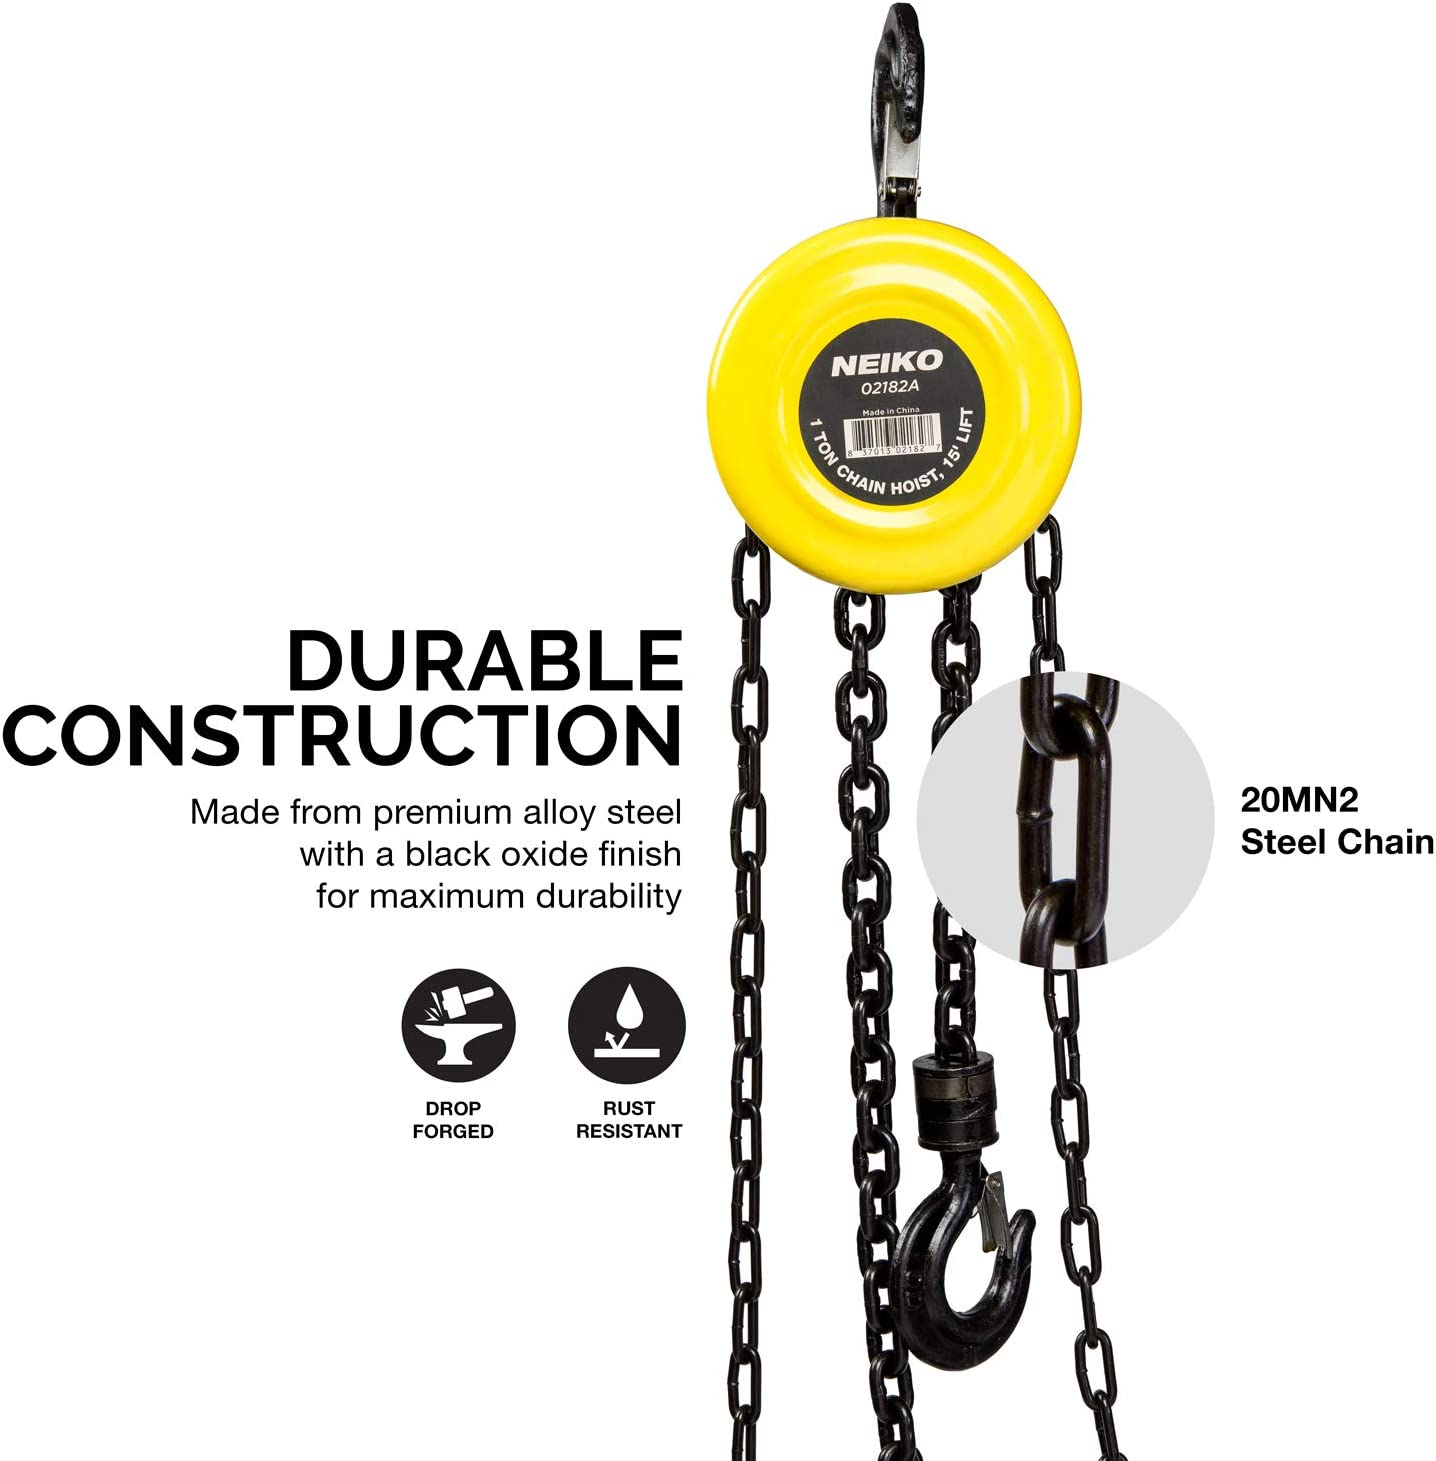 1 Ton CapacityManual Hand Chain Block 20 Foot Neiko Chain Hoist with 2 Hooks